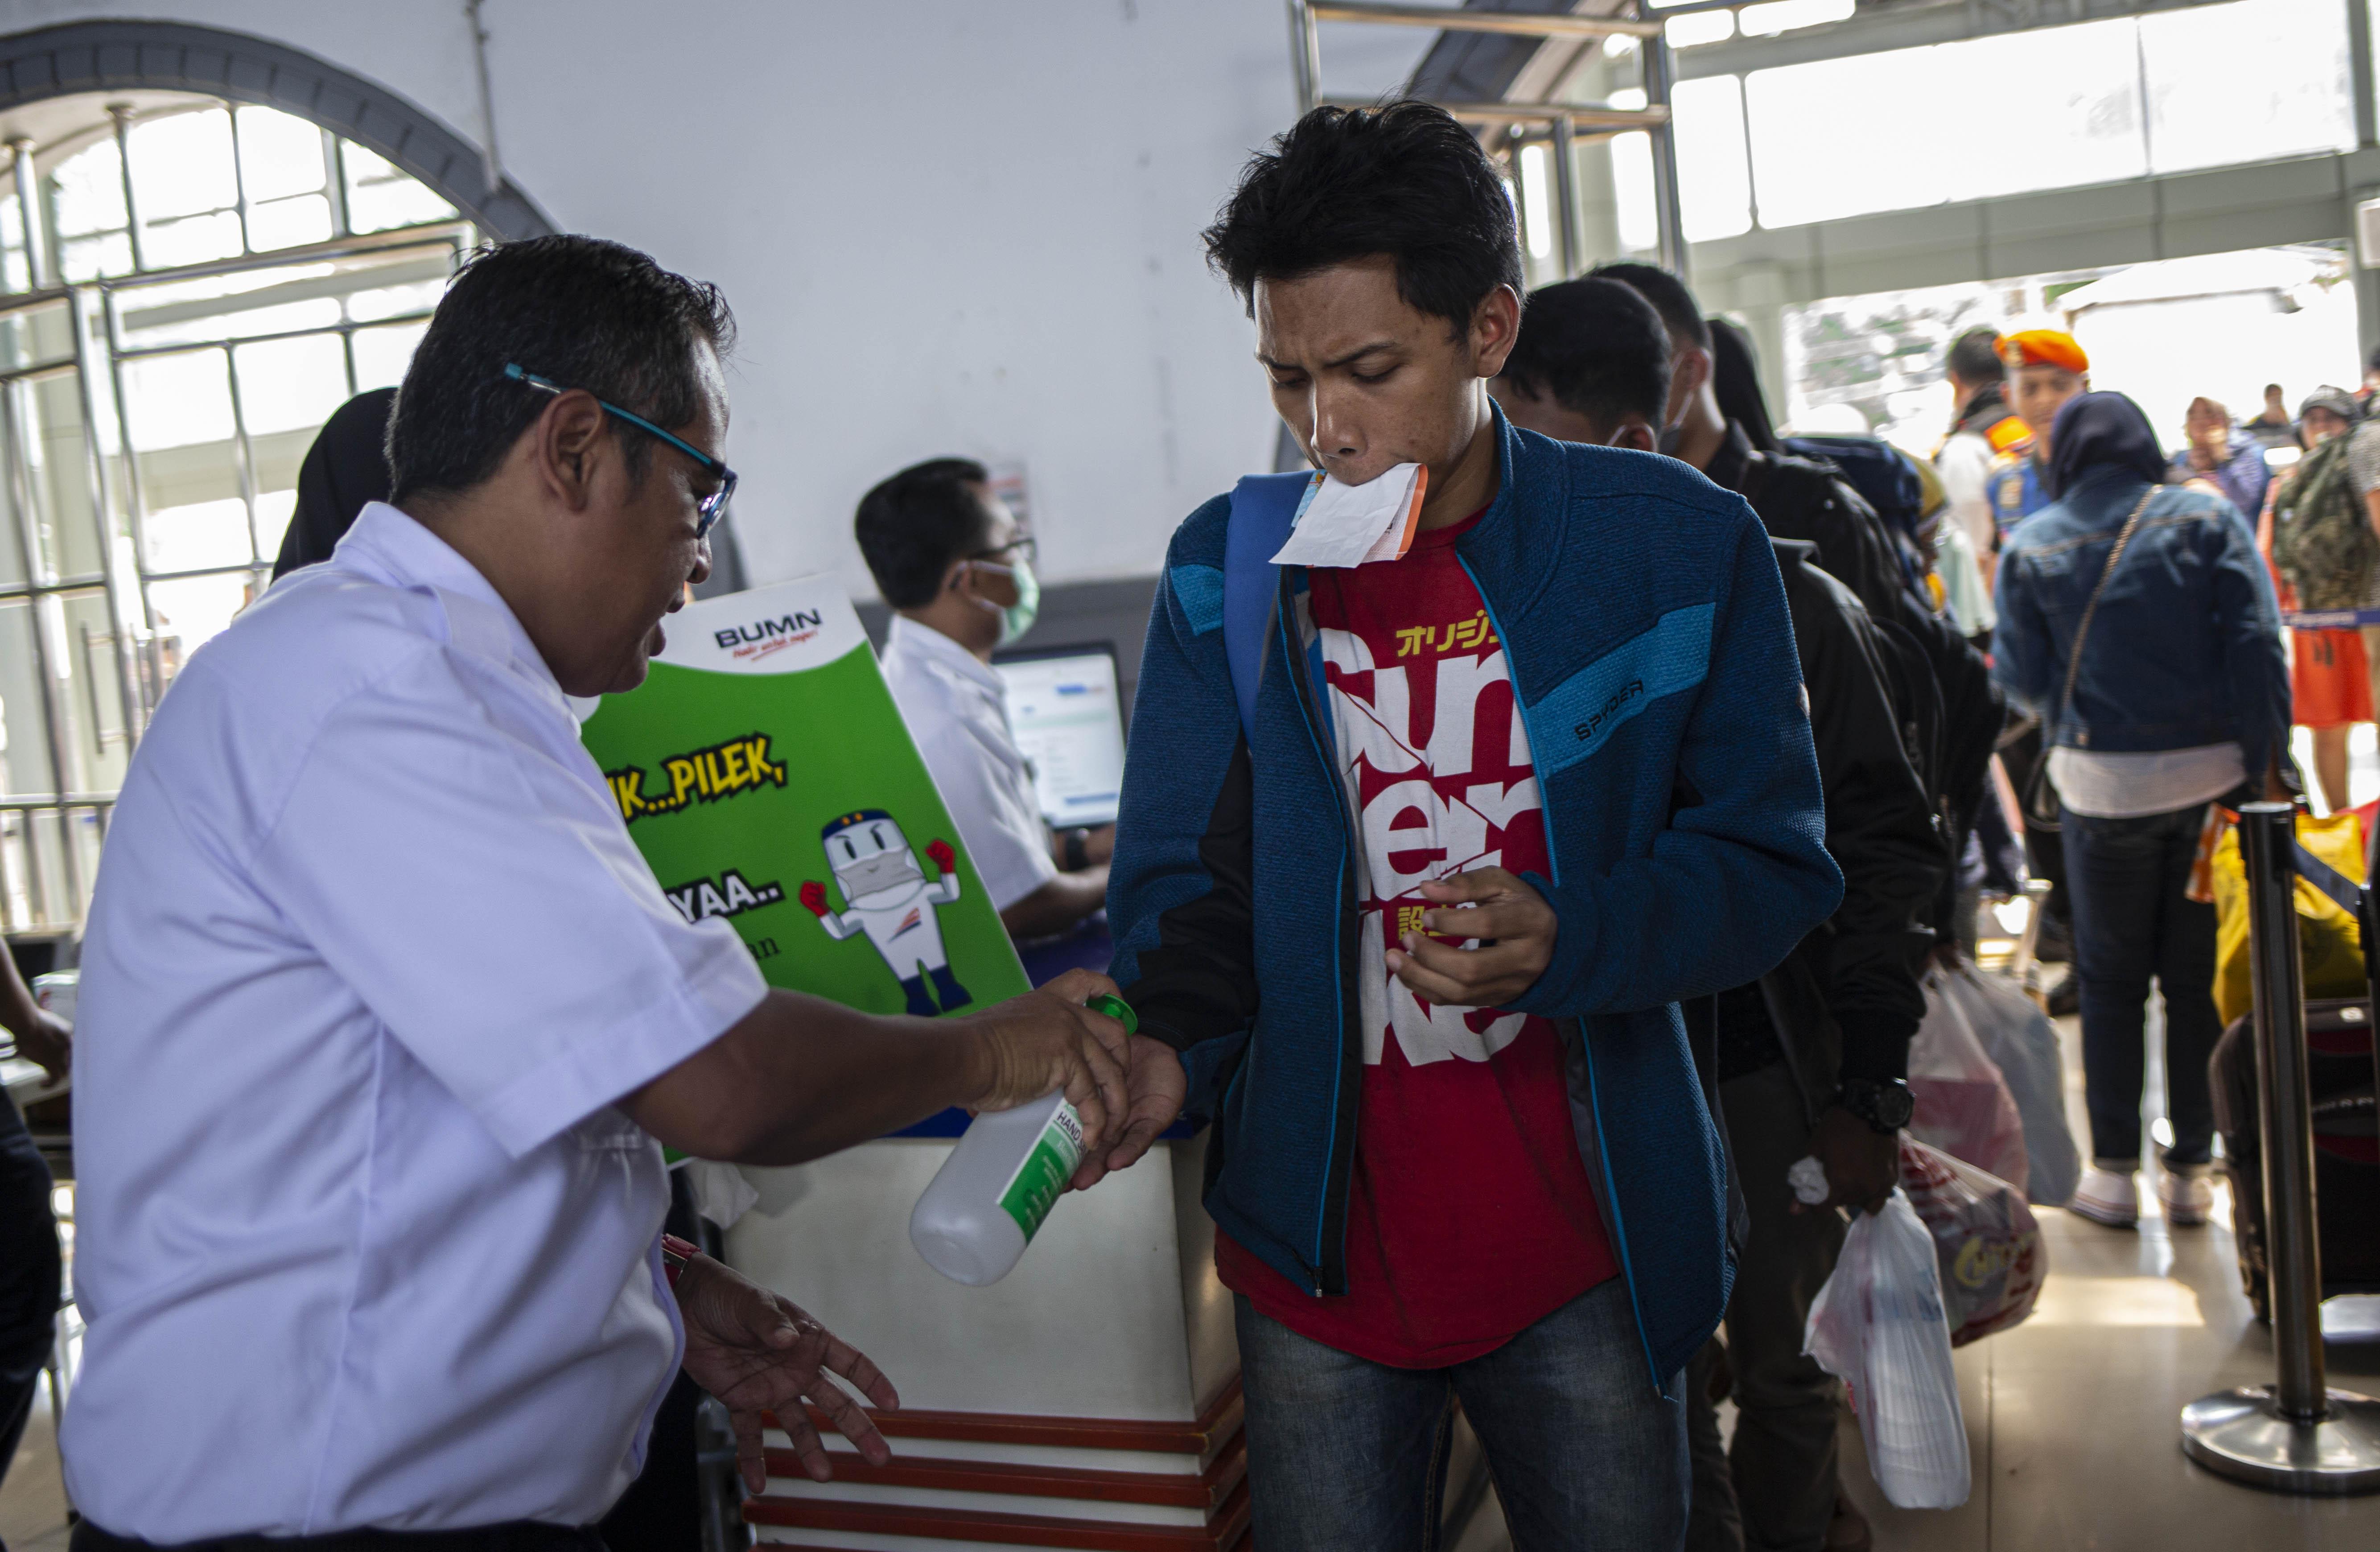 Sosialisasi Virus Corona di Stasiun Pasar Senen